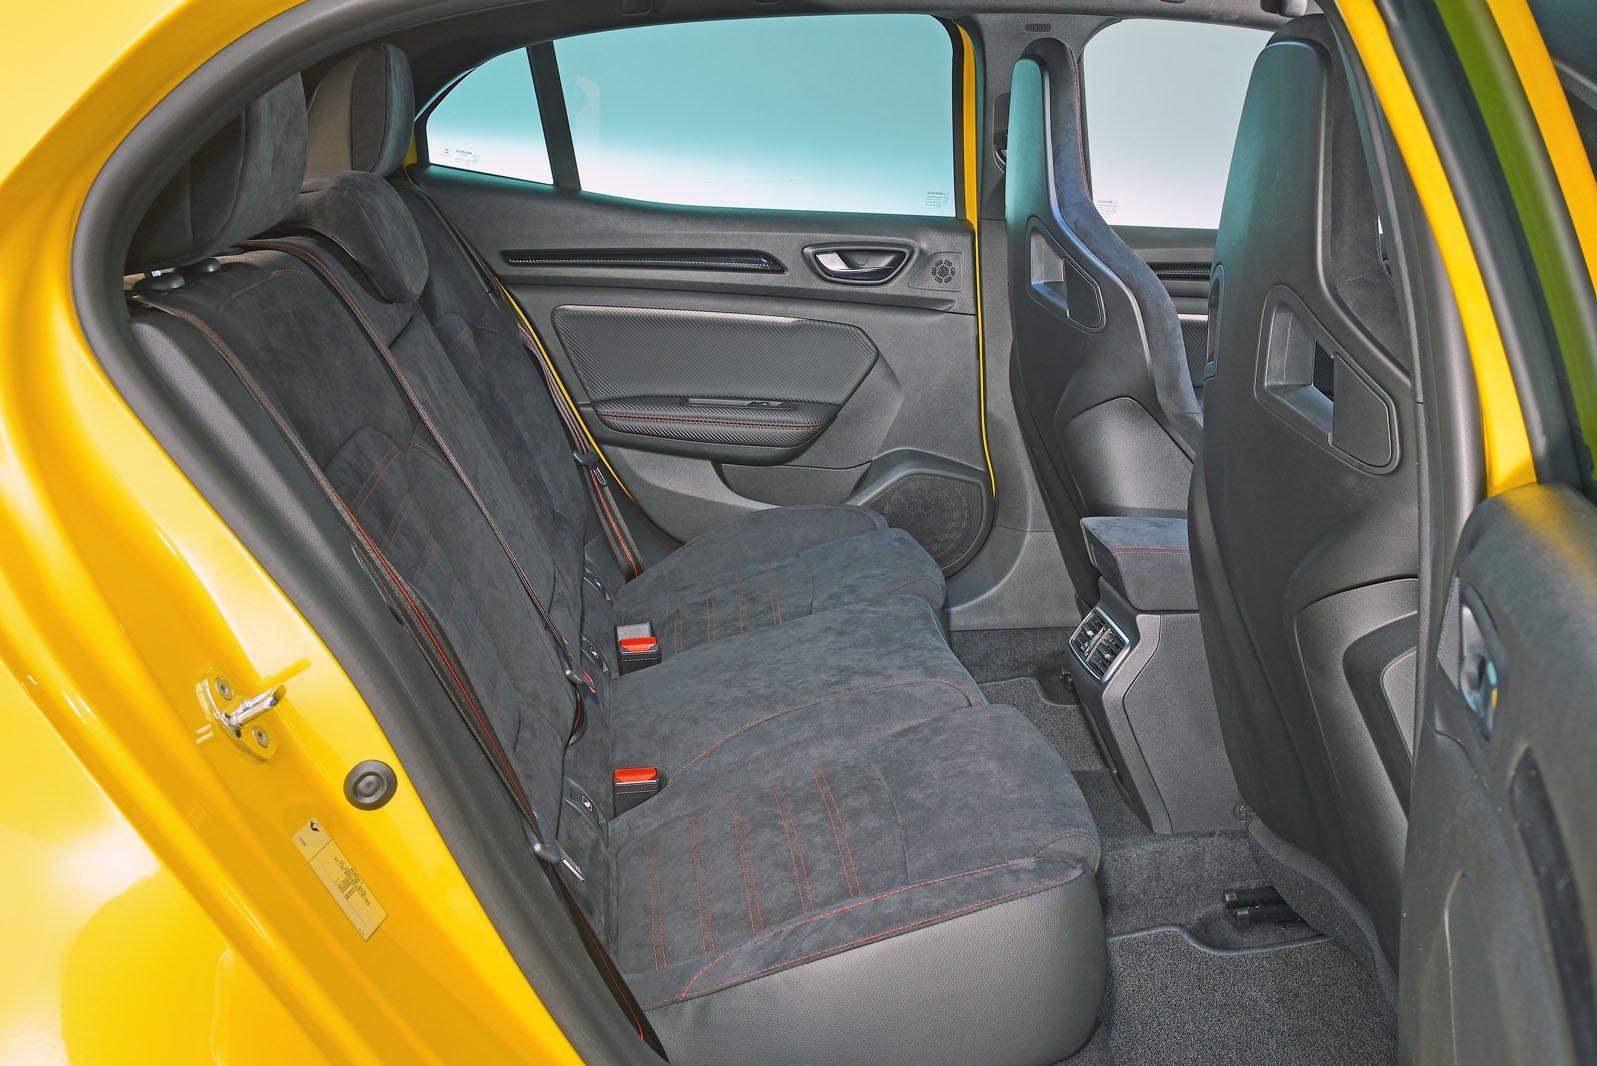 Renault Megane RS rear seats